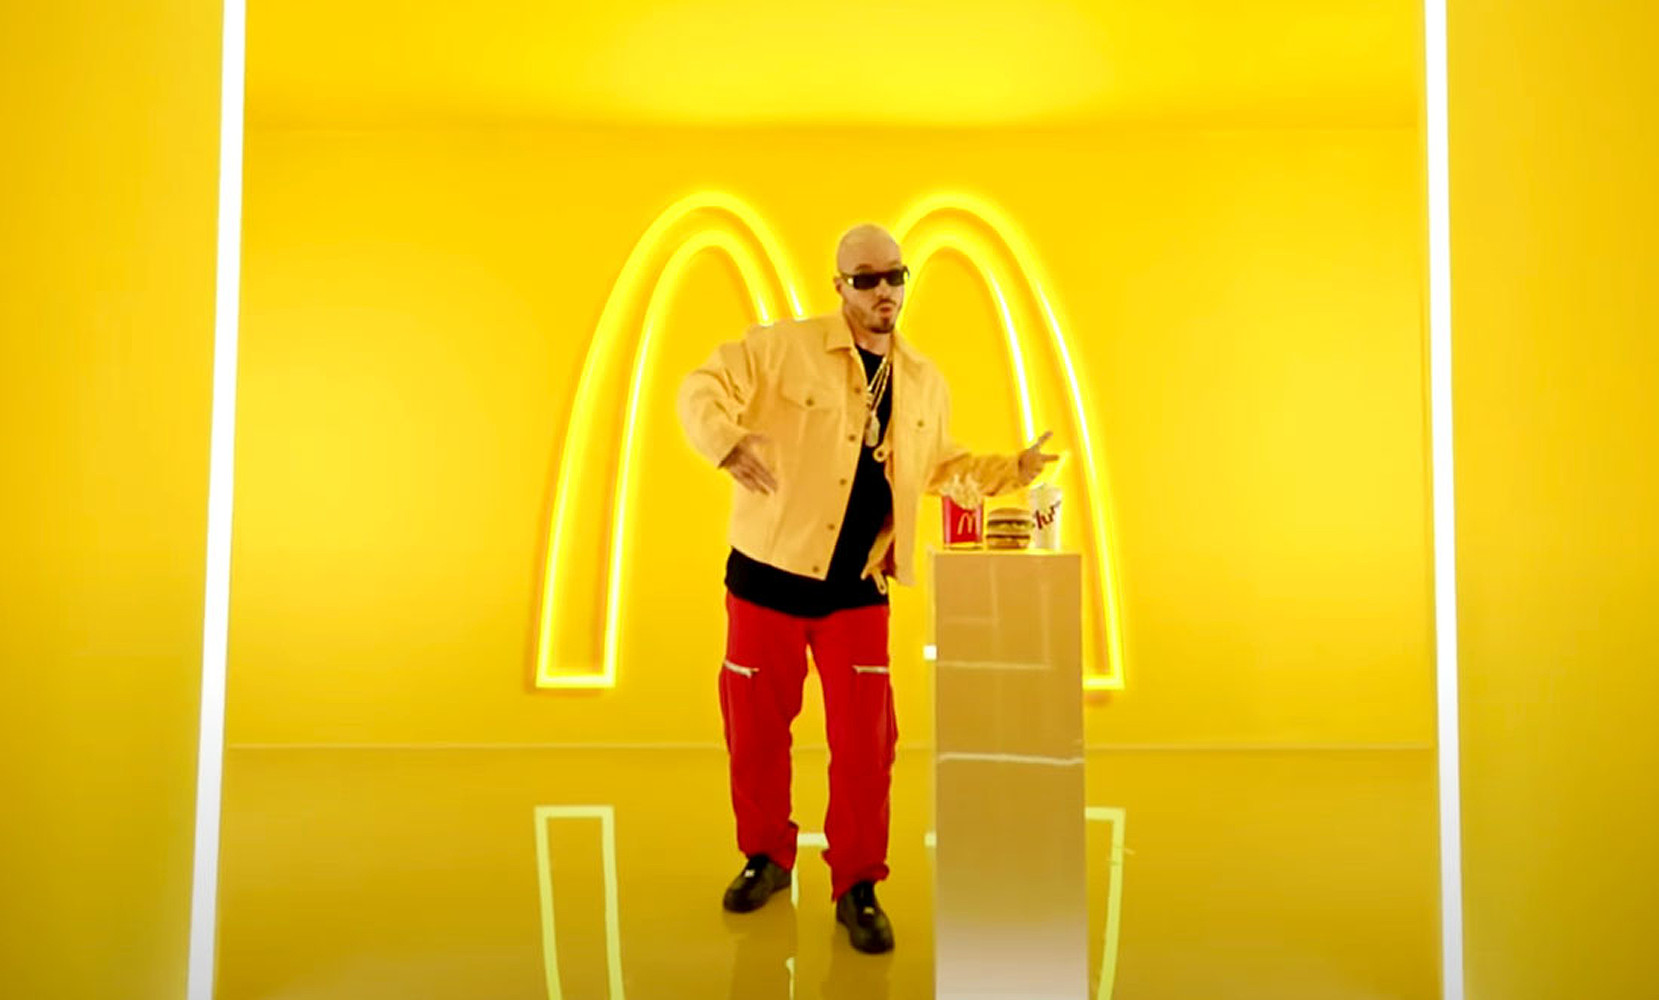 J Balvin x McDonald's